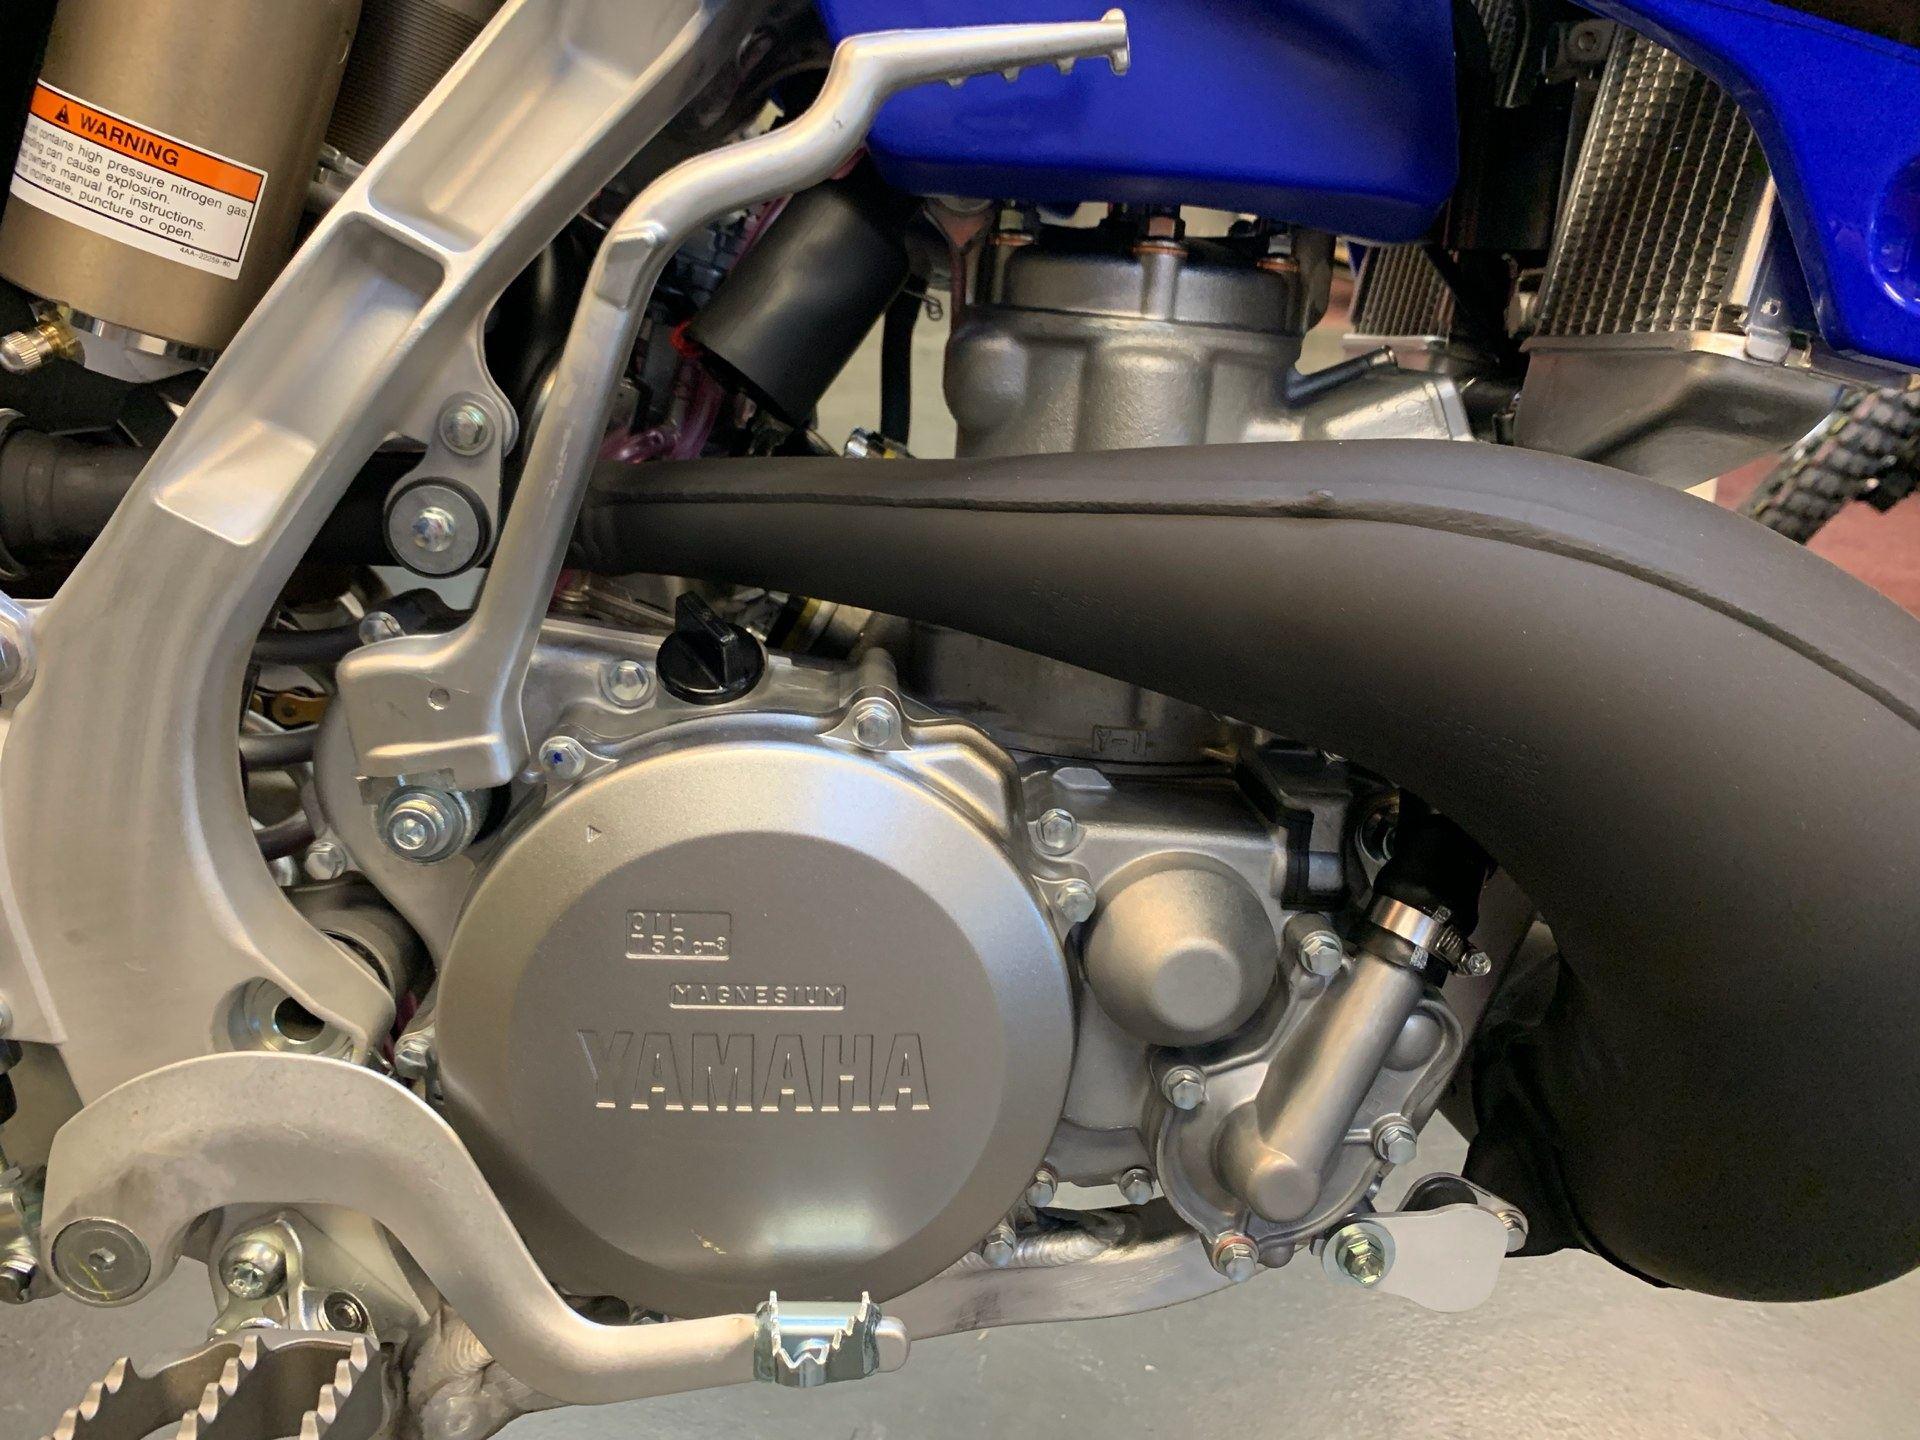 2020 Yamaha YZ250 in Petersburg, West Virginia